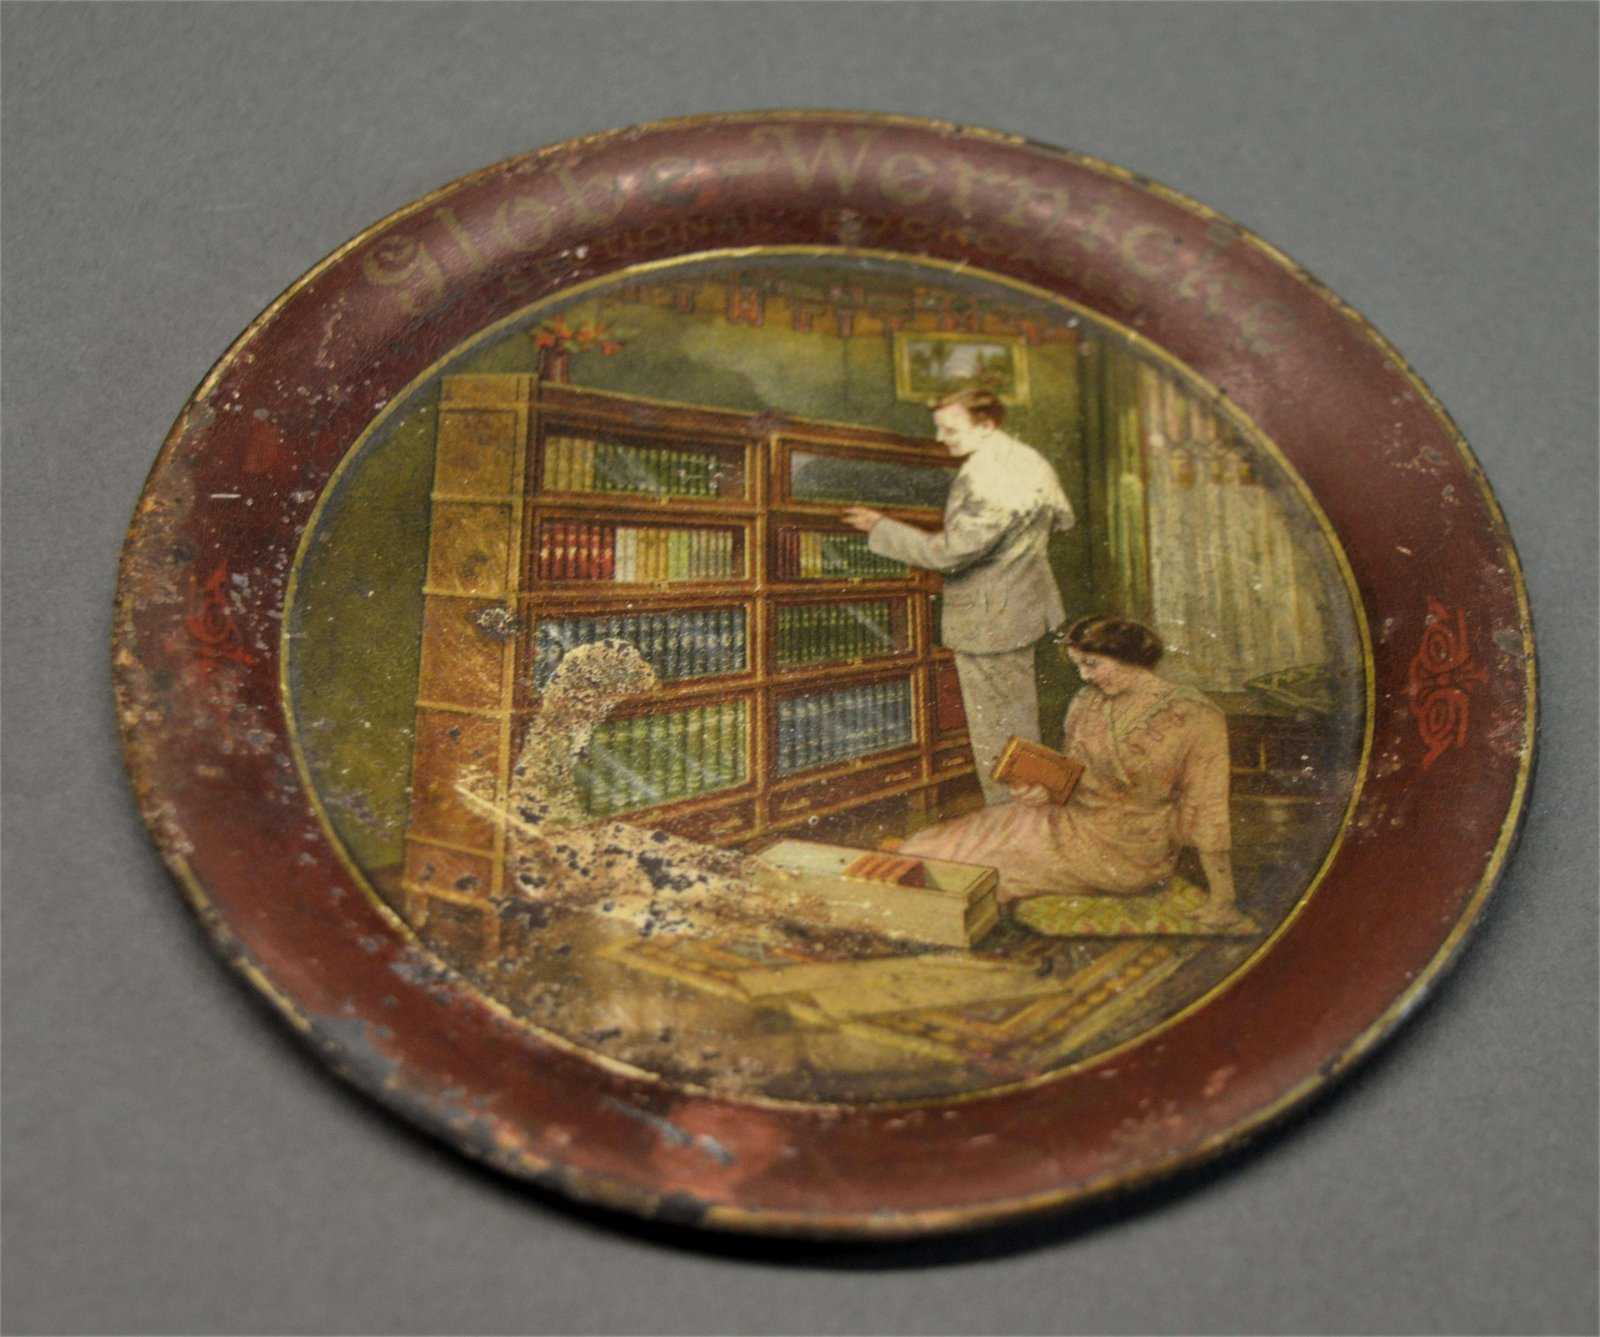 Antique Globe-Wernicke Advertising Tip Tray